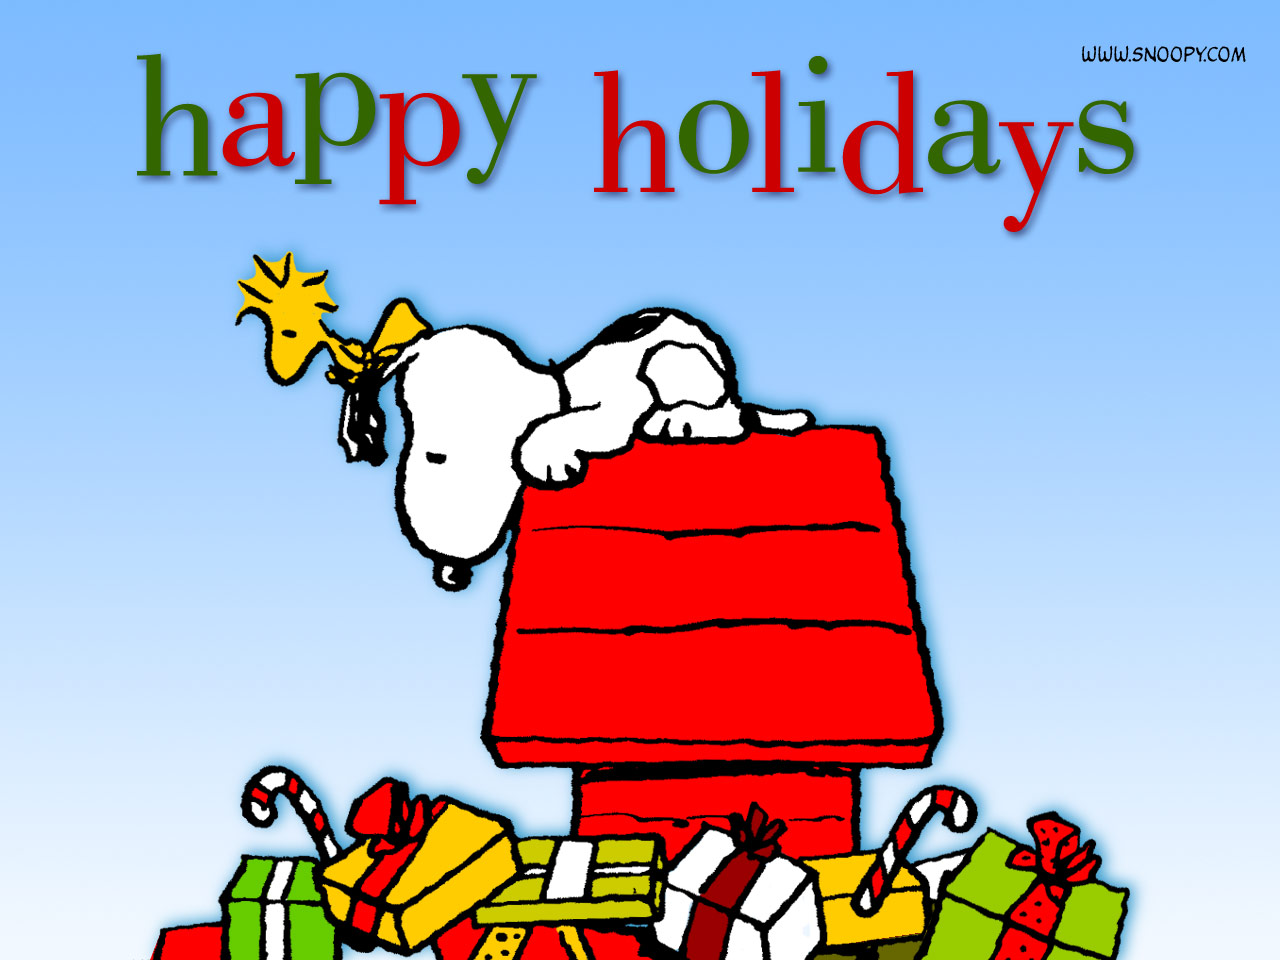 Peanuts Snoopy Christmas 1280x960